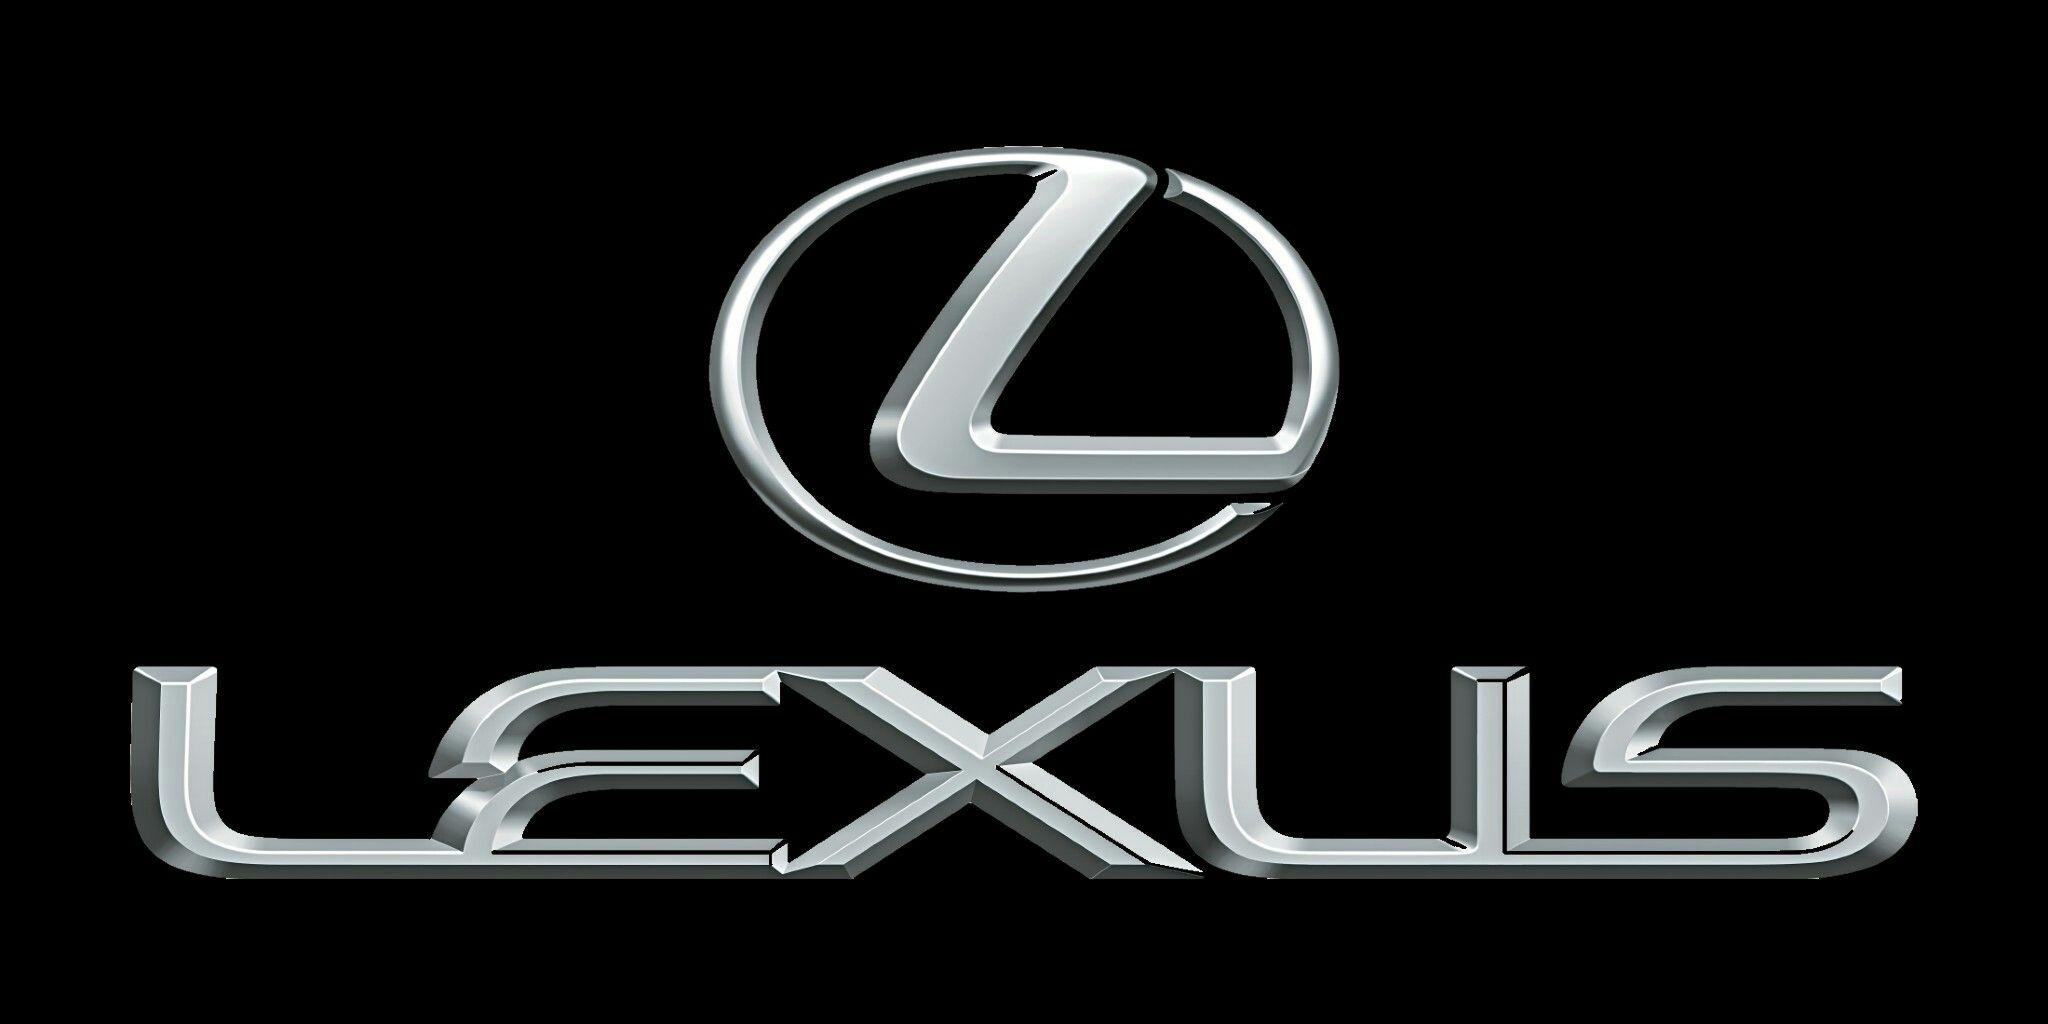 2048x1024 Lexus Logo Car Symbol Vector Free Download